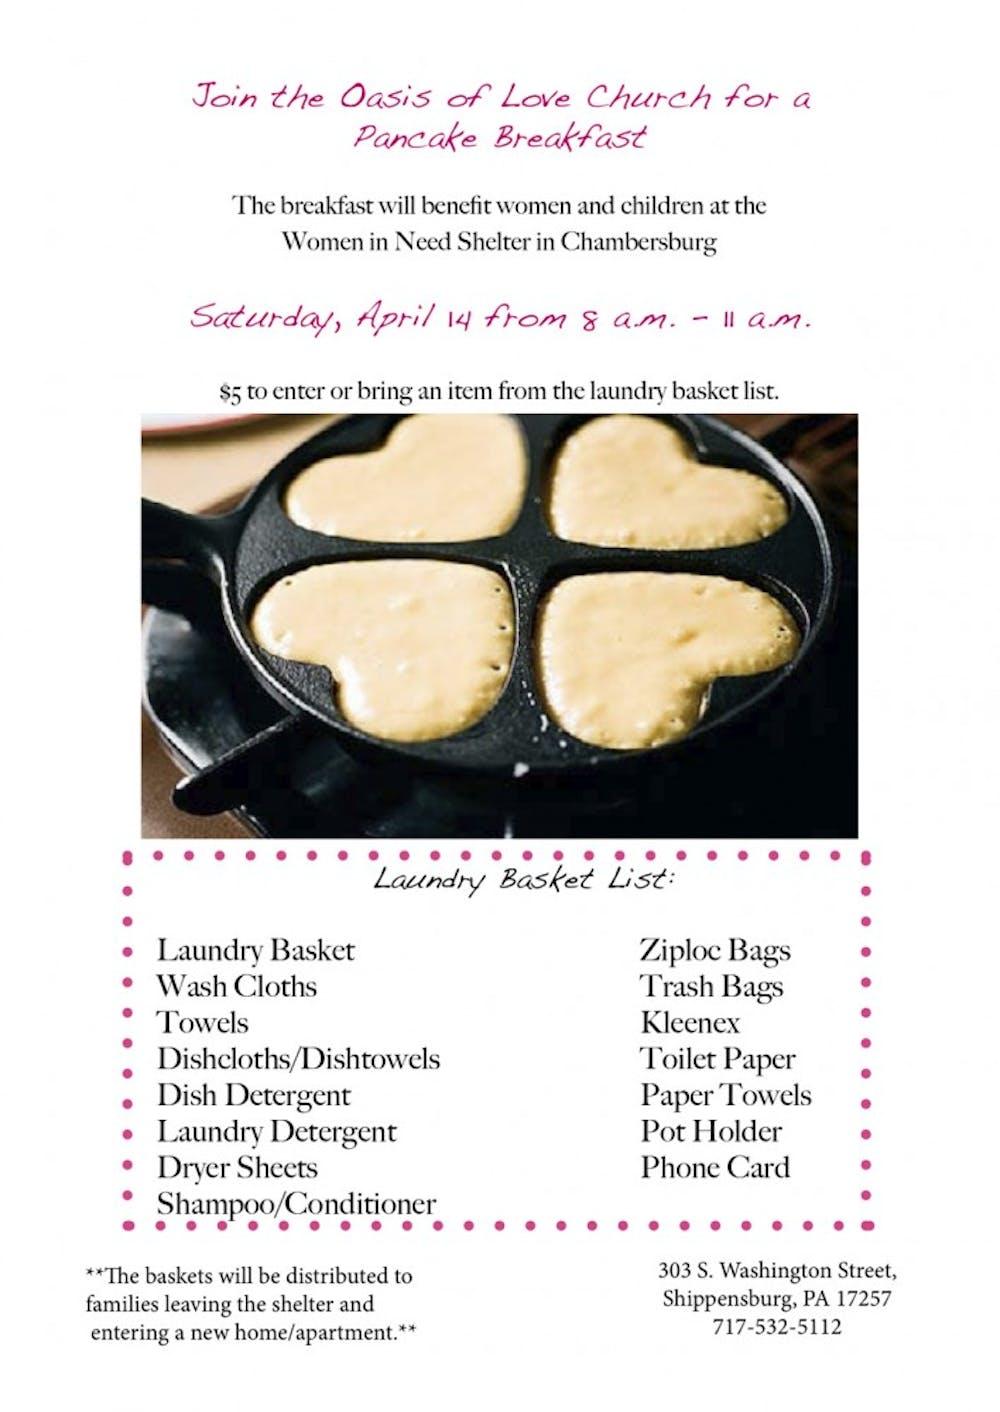 Oasis of Love Church to host pancake breakfast